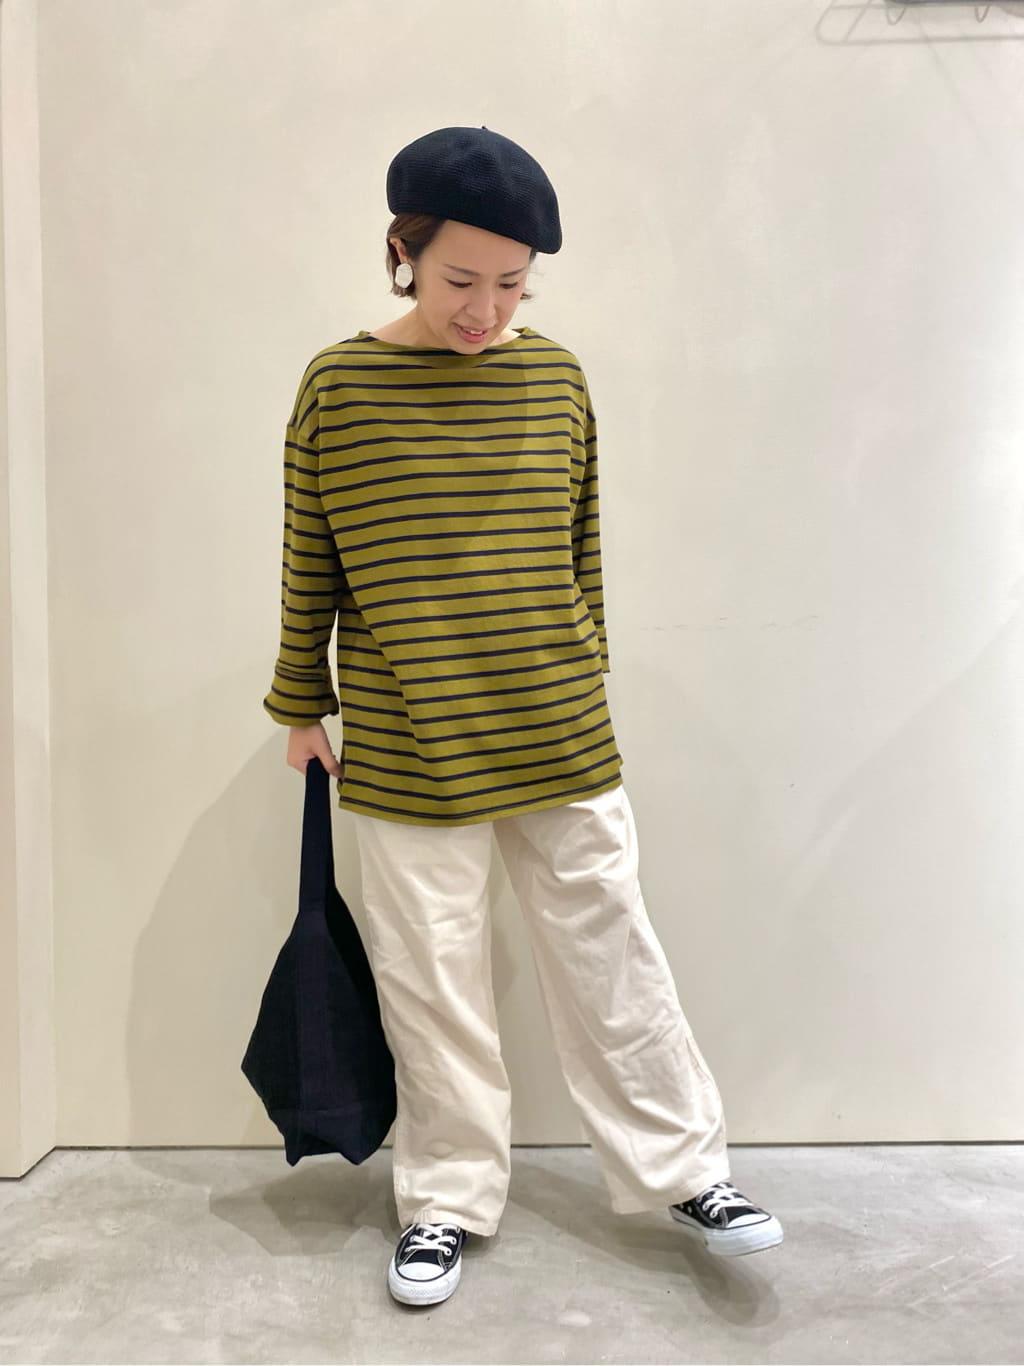 - CHILD WOMAN CHILD WOMAN , PAR ICI ルミネ池袋 身長:155cm 2021.08.24